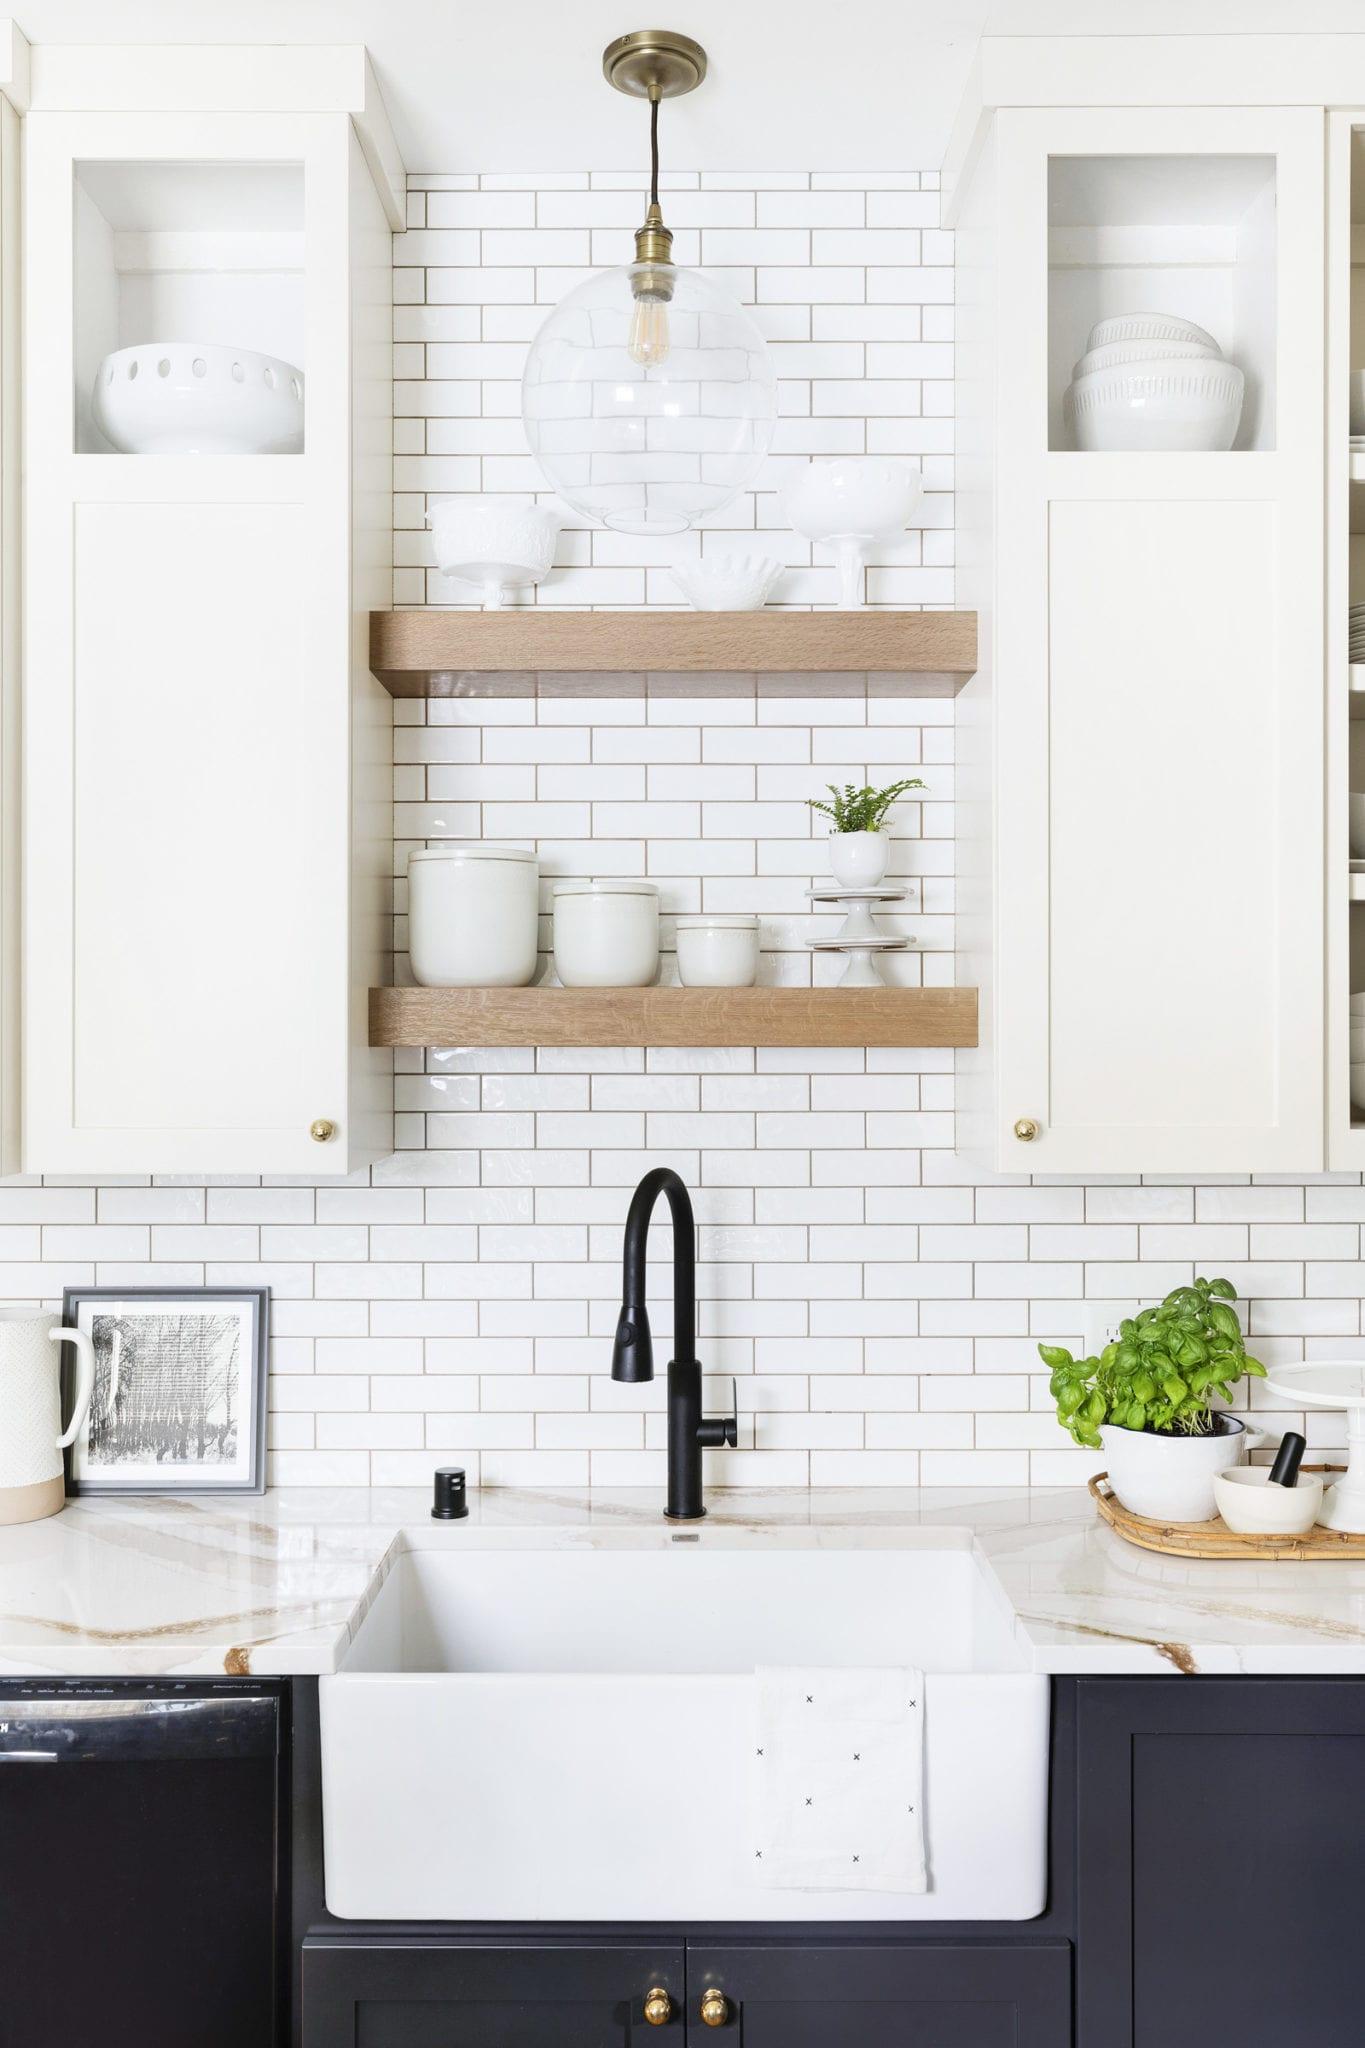 Our Favorite Kitchen Backsplash Tiles | Bria Hammel Interiors